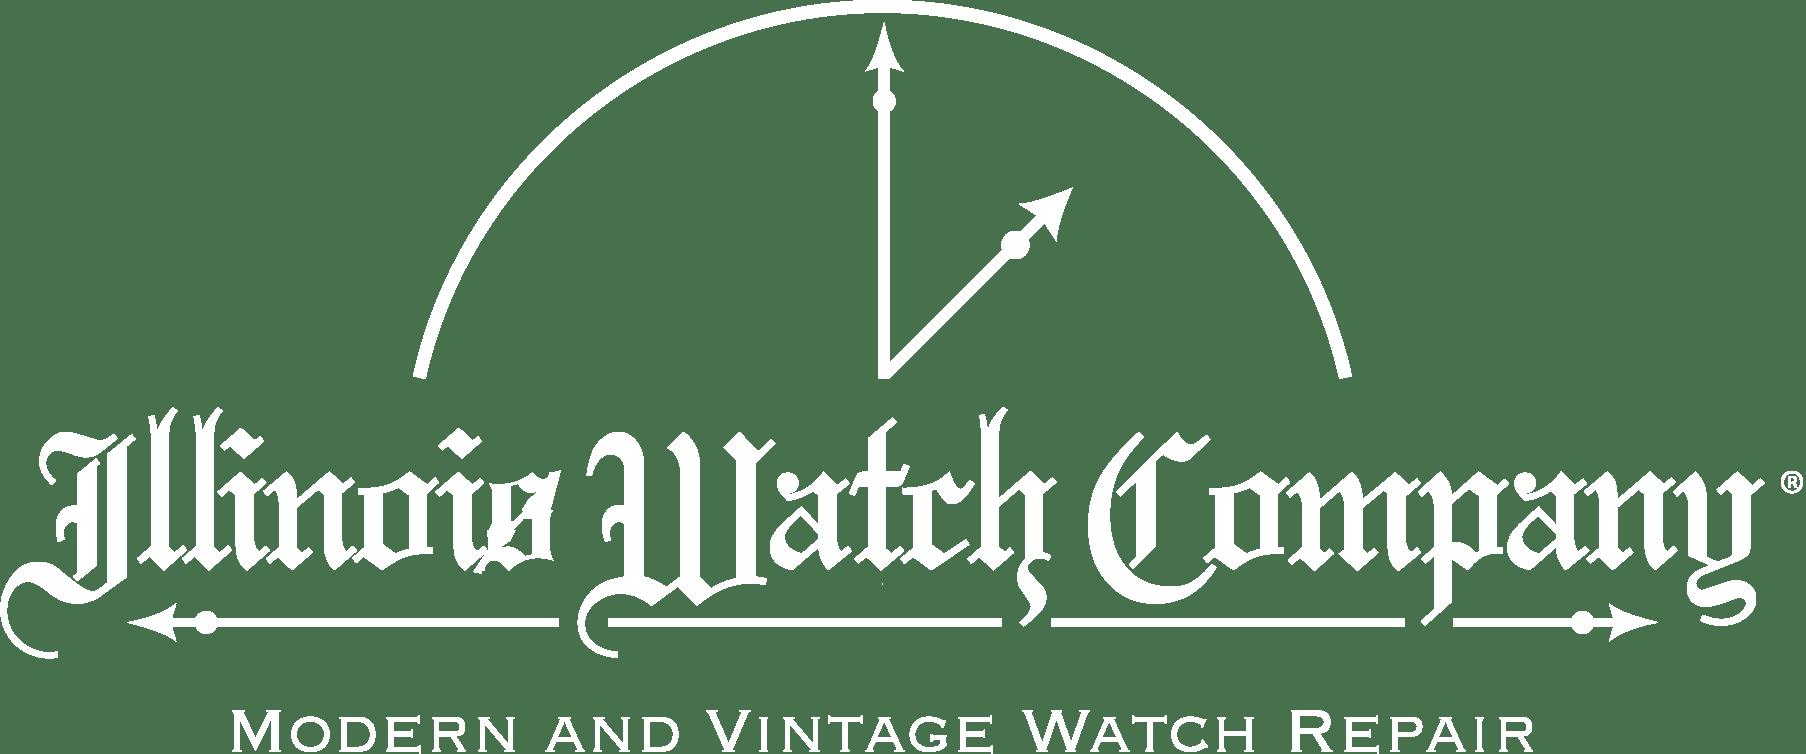 Illinois Watch Company